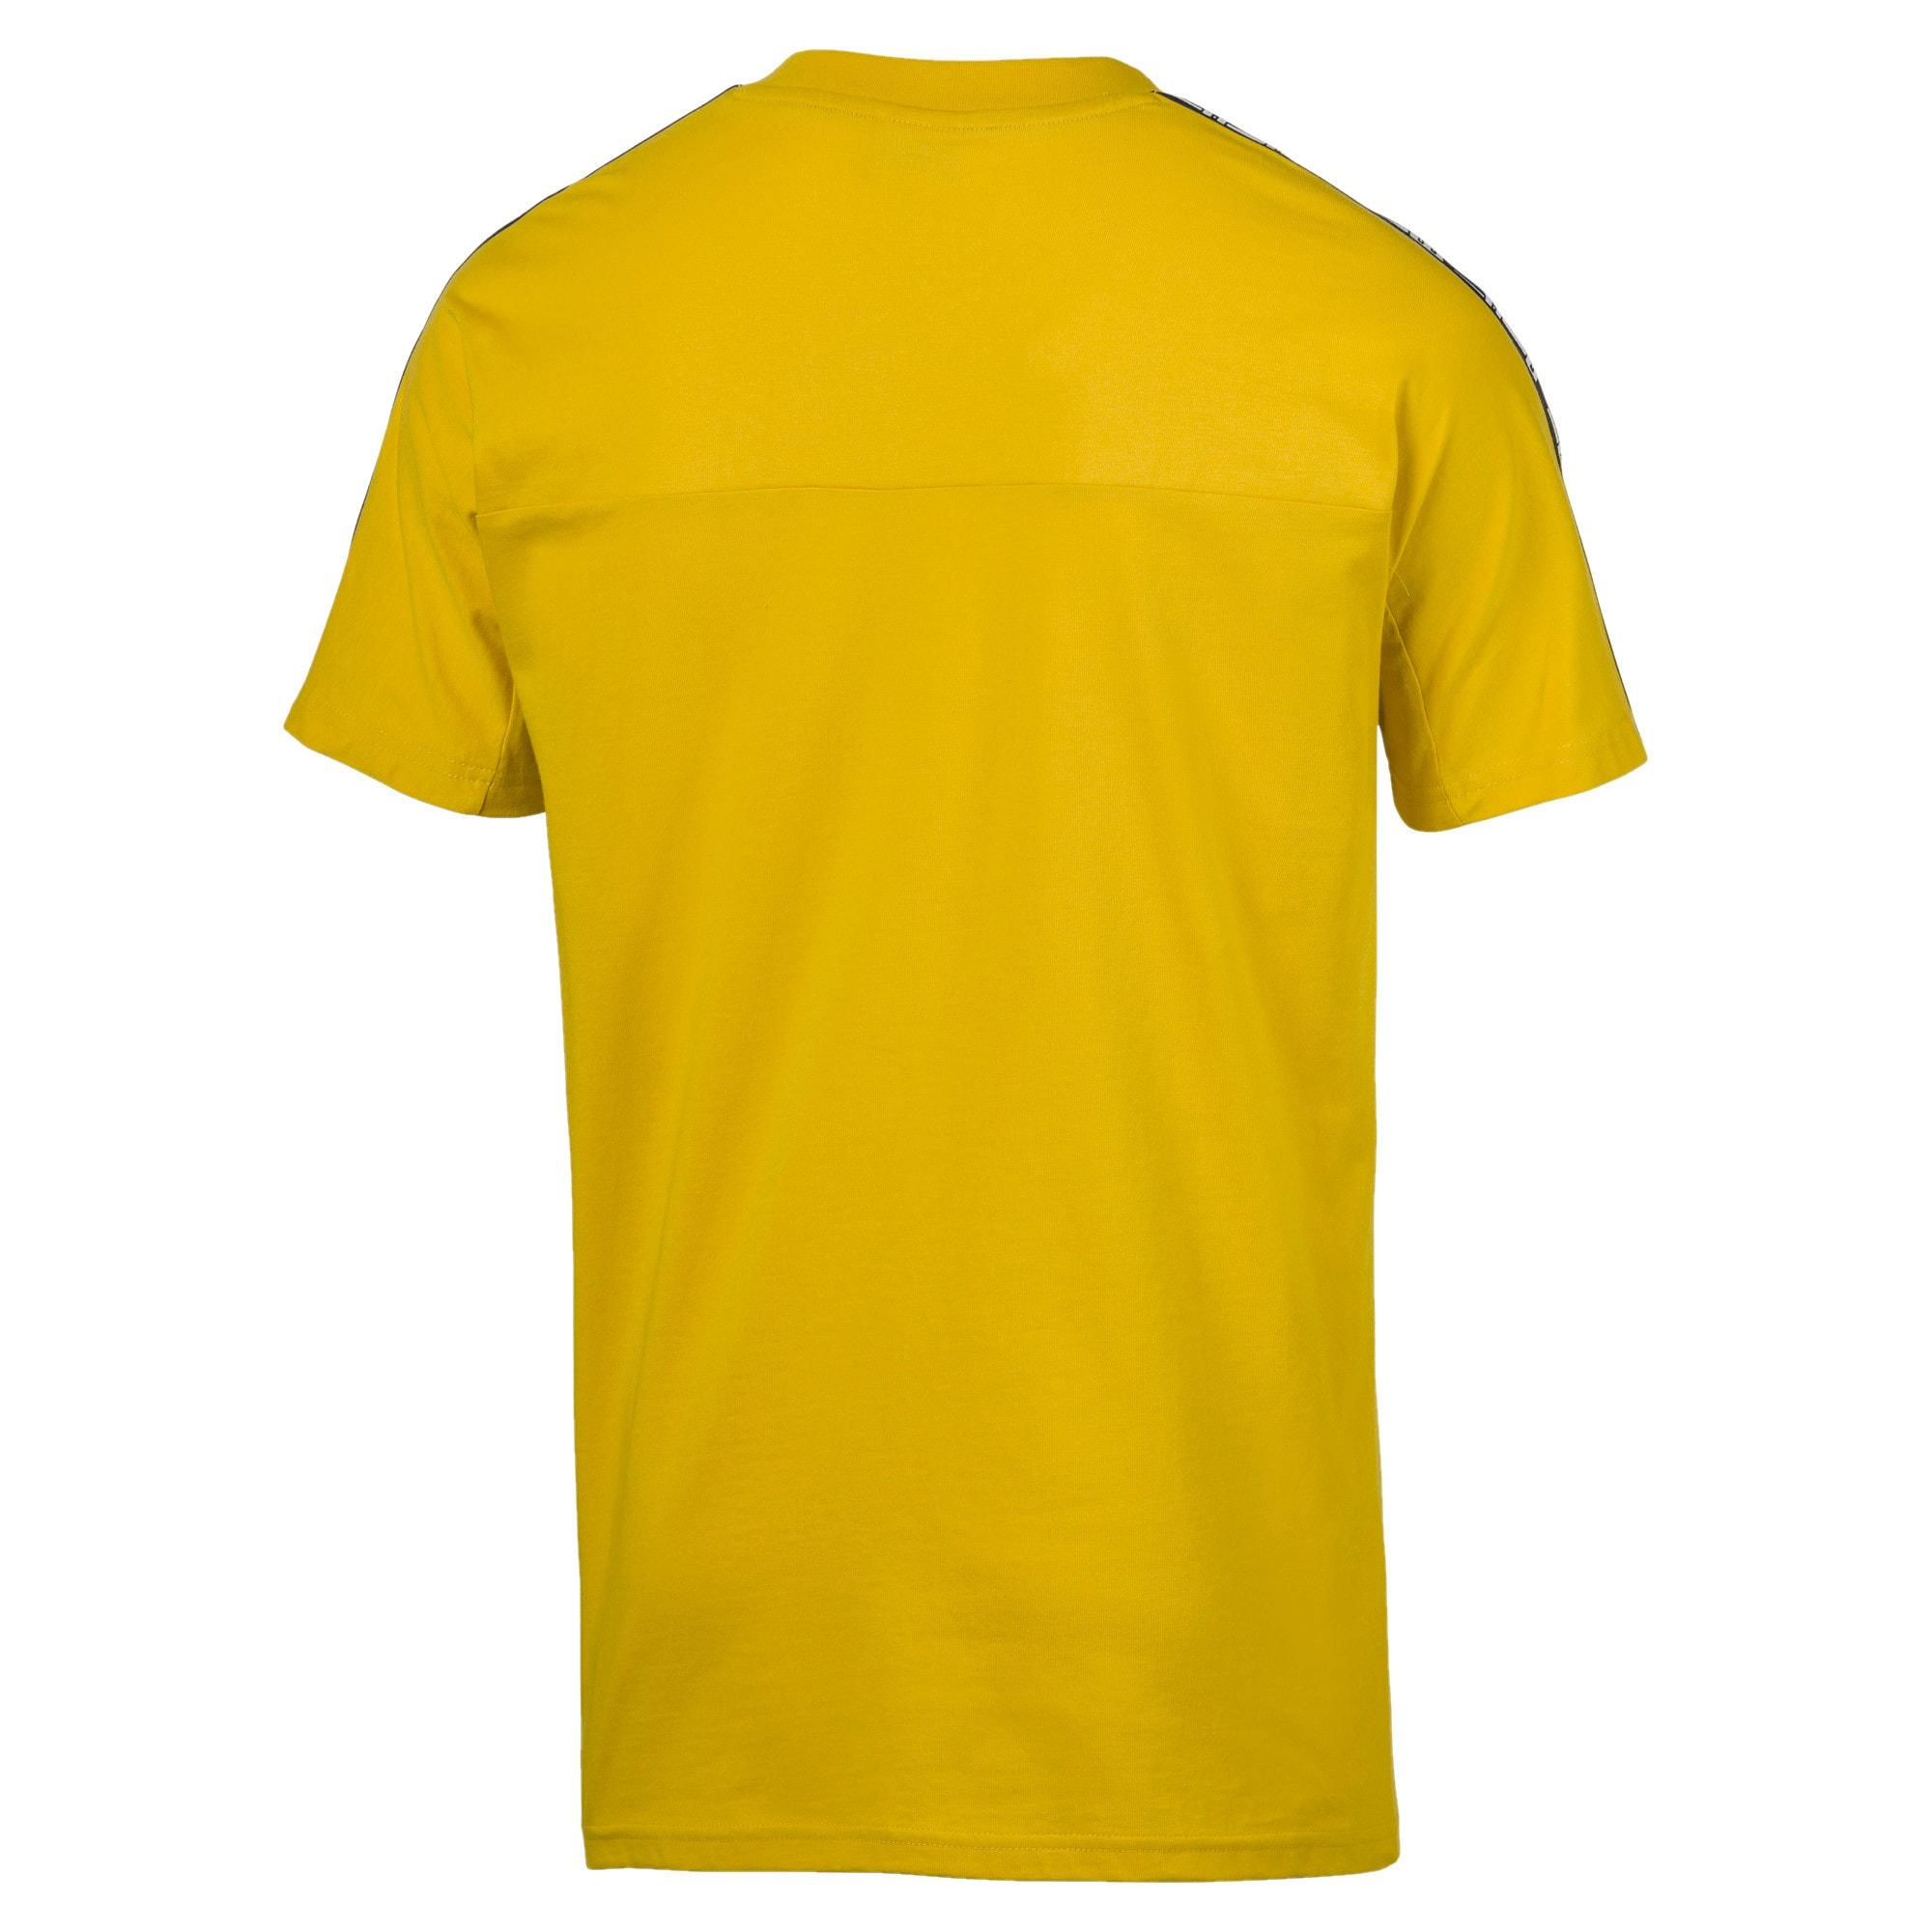 Thumbnail 6 of PUMA XTG SS Tシャツ, Sulphur, medium-JPN